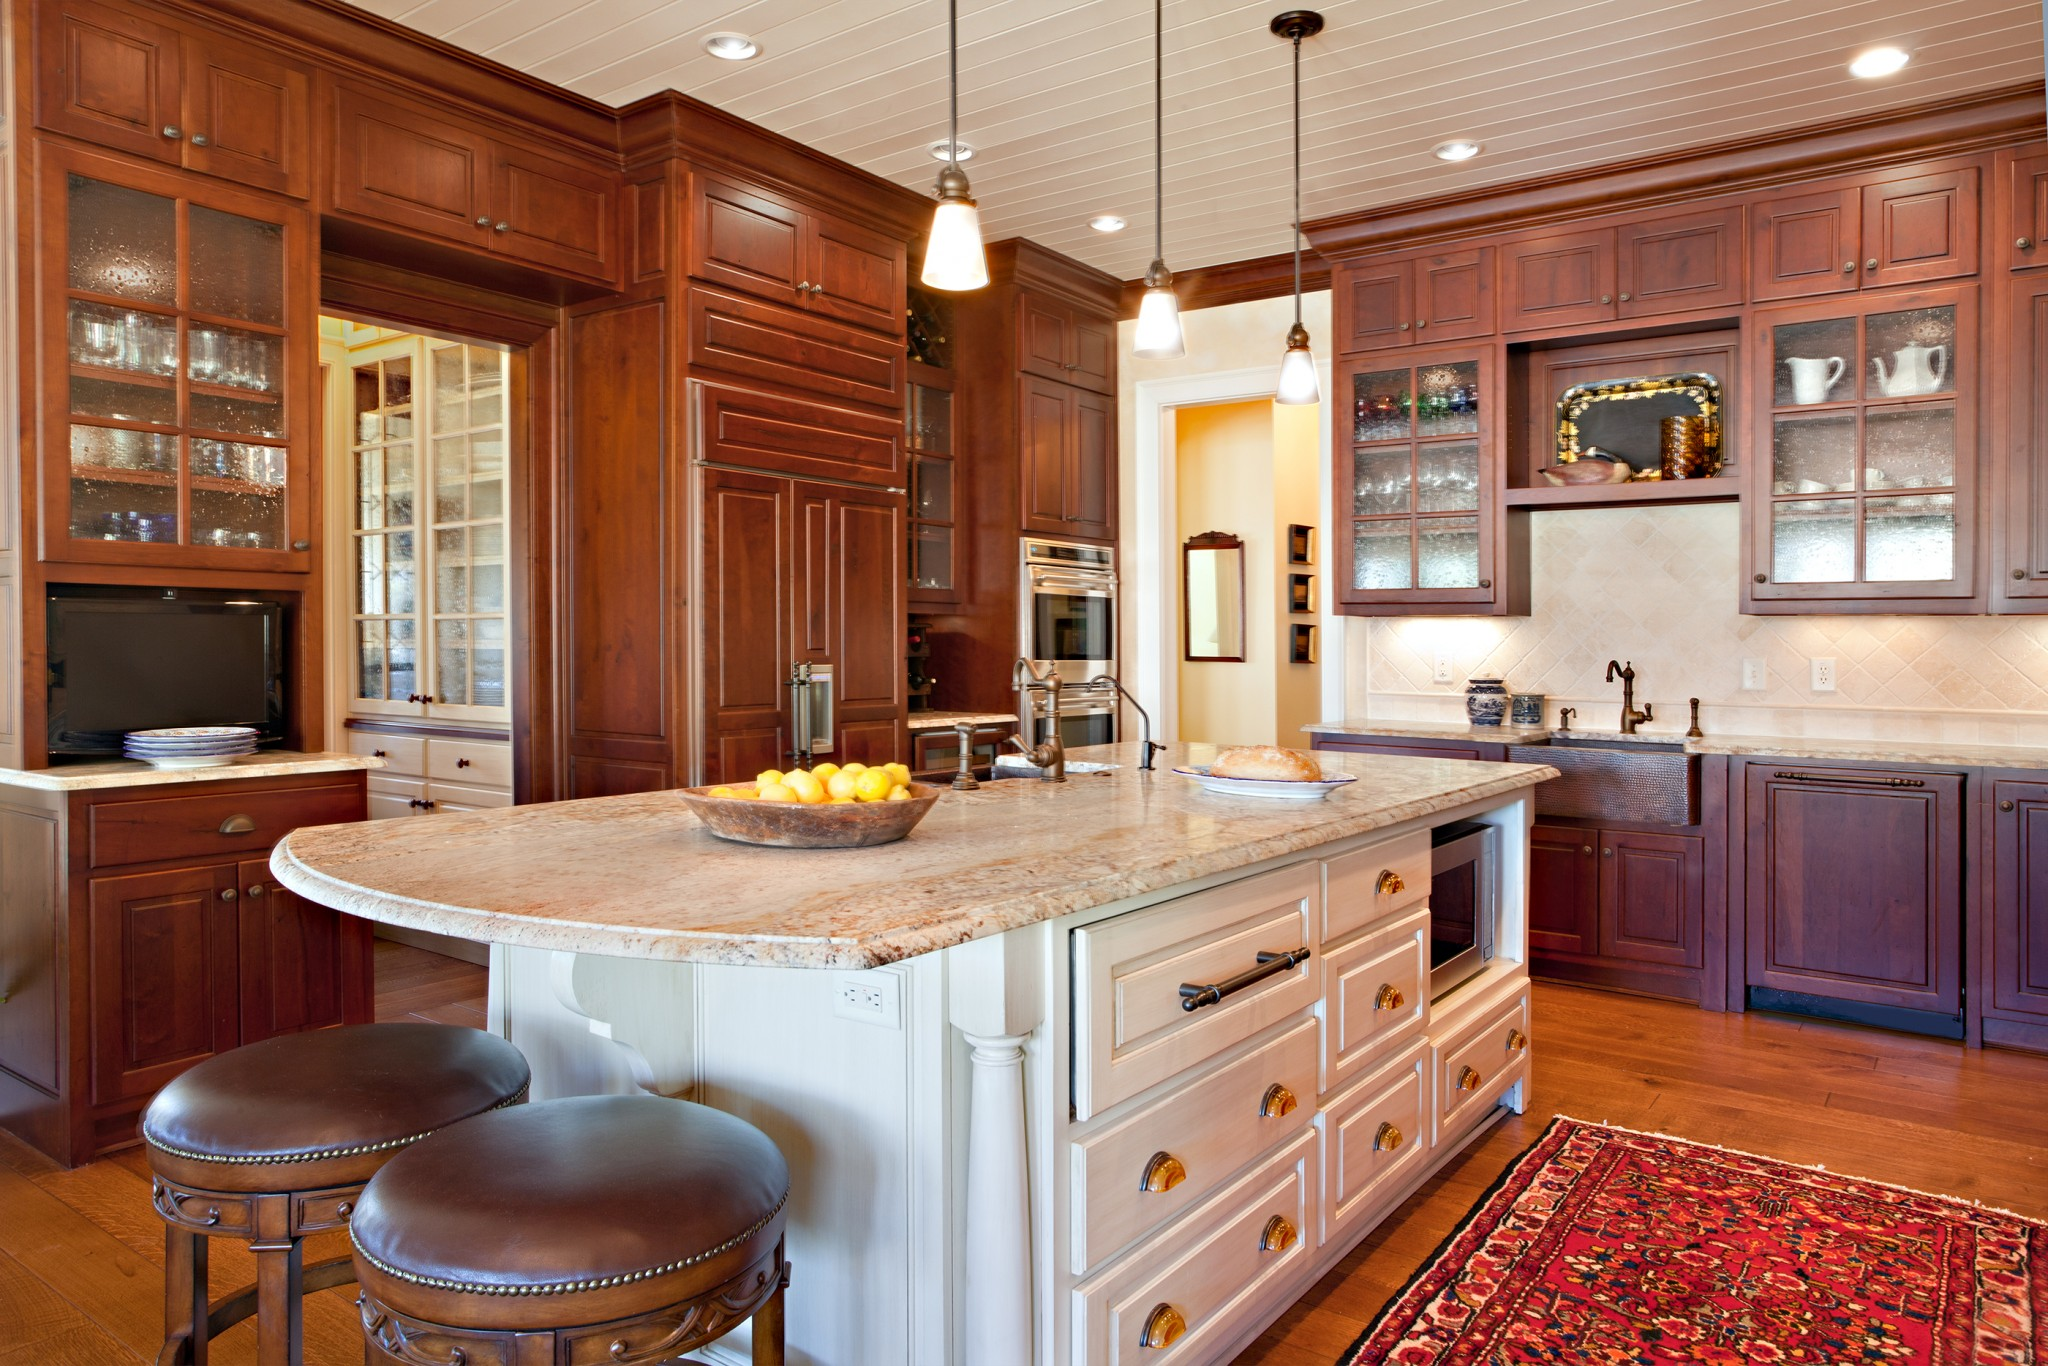 Kitchen Featured on Williams-Sonoma's Cultivate.com 3